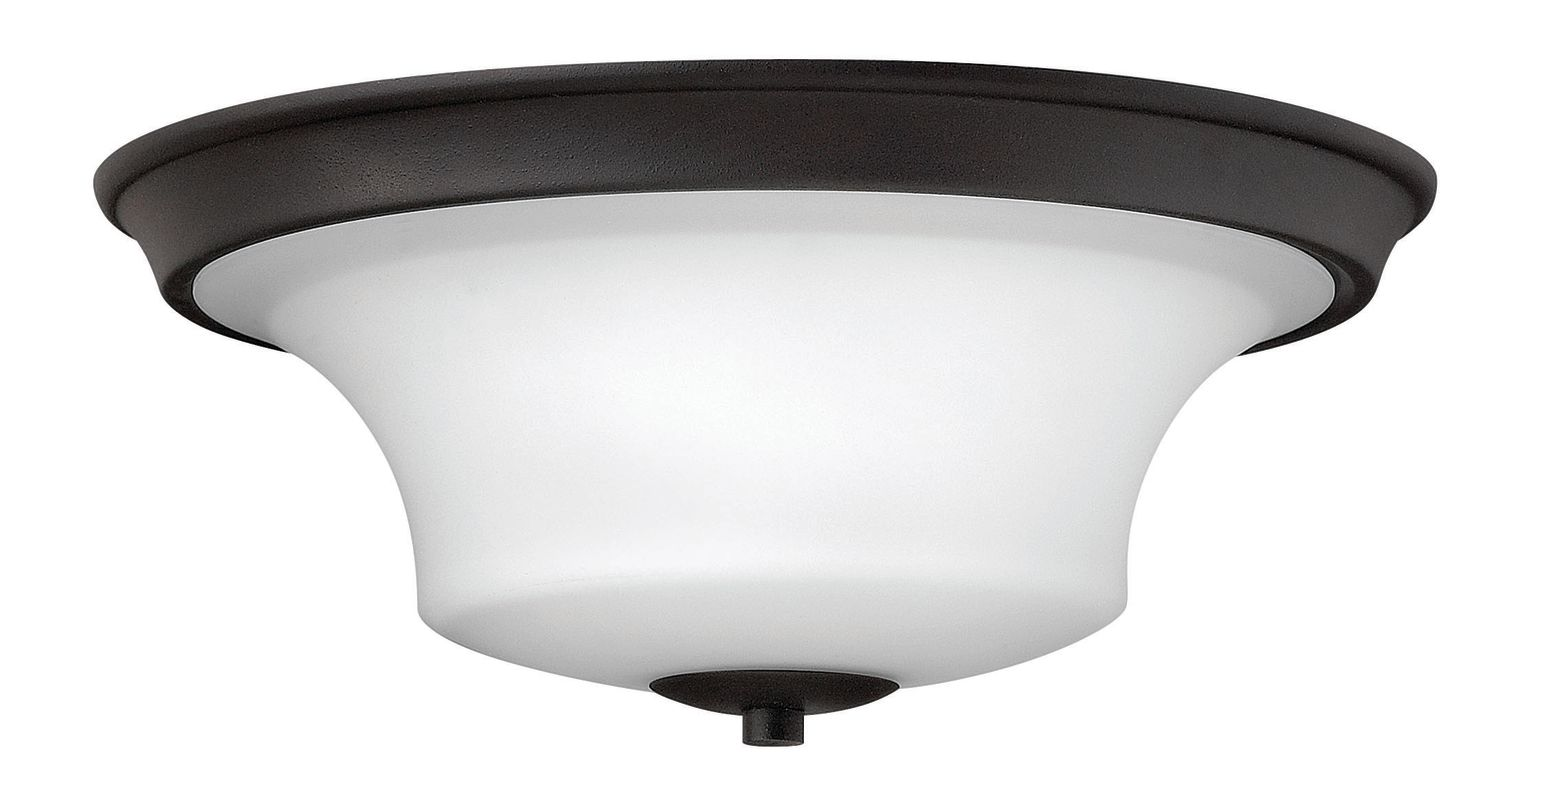 Hinkley Lighting 4631 3 Light Indoor Flush Mount Ceiling Fixture from Sale $159.00 ITEM: bci1399350 ID#:4631TB UPC: 640665463101 :